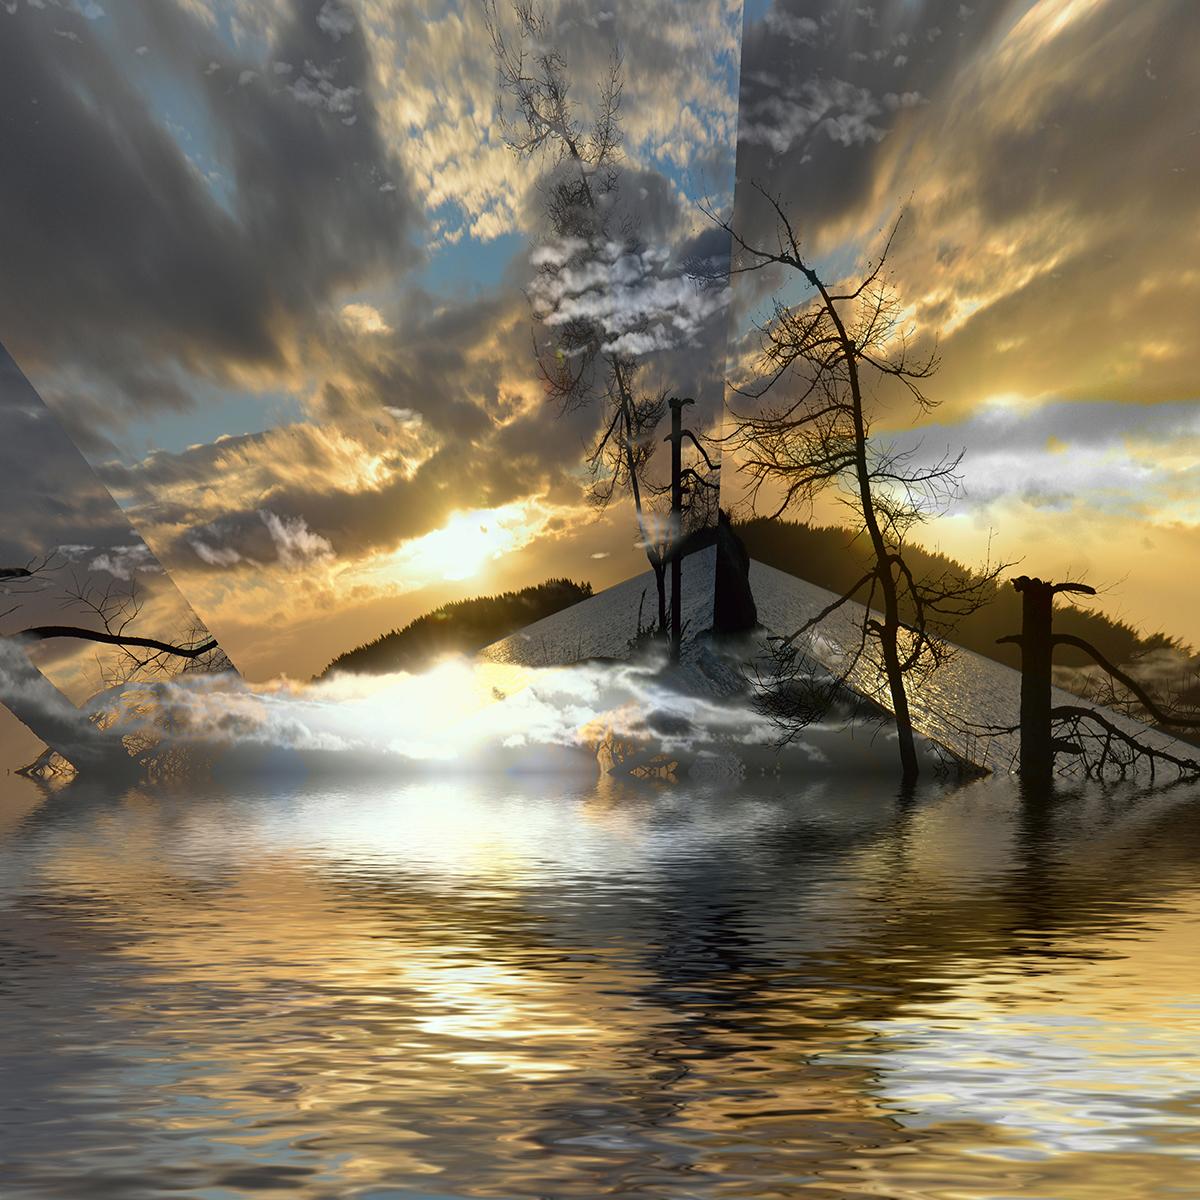 Ocean Cloud Reflections